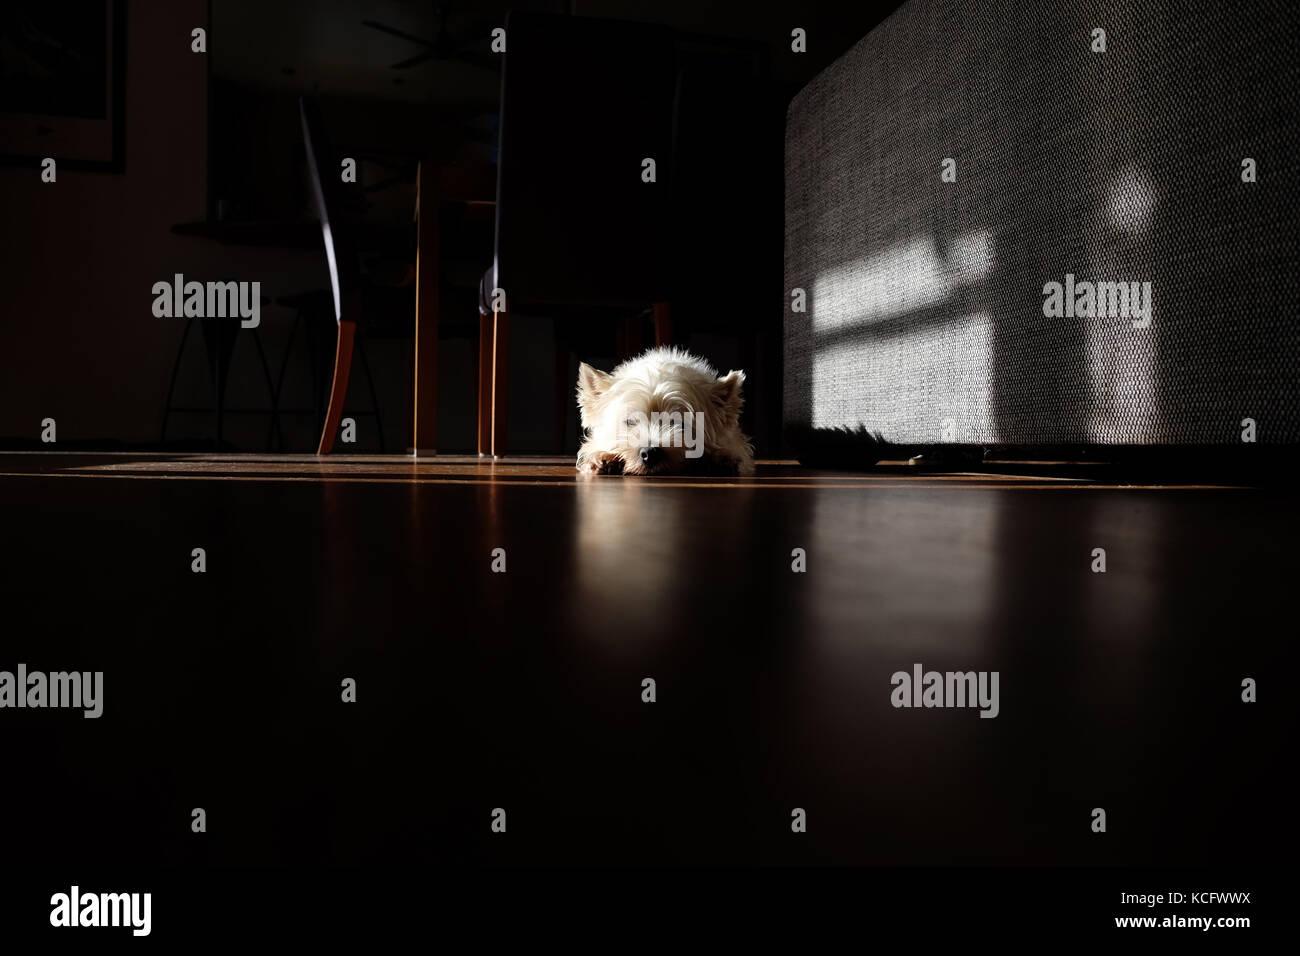 west highland white terrier westie dog sunbathing in sun puddle inside house living room - Stock Image